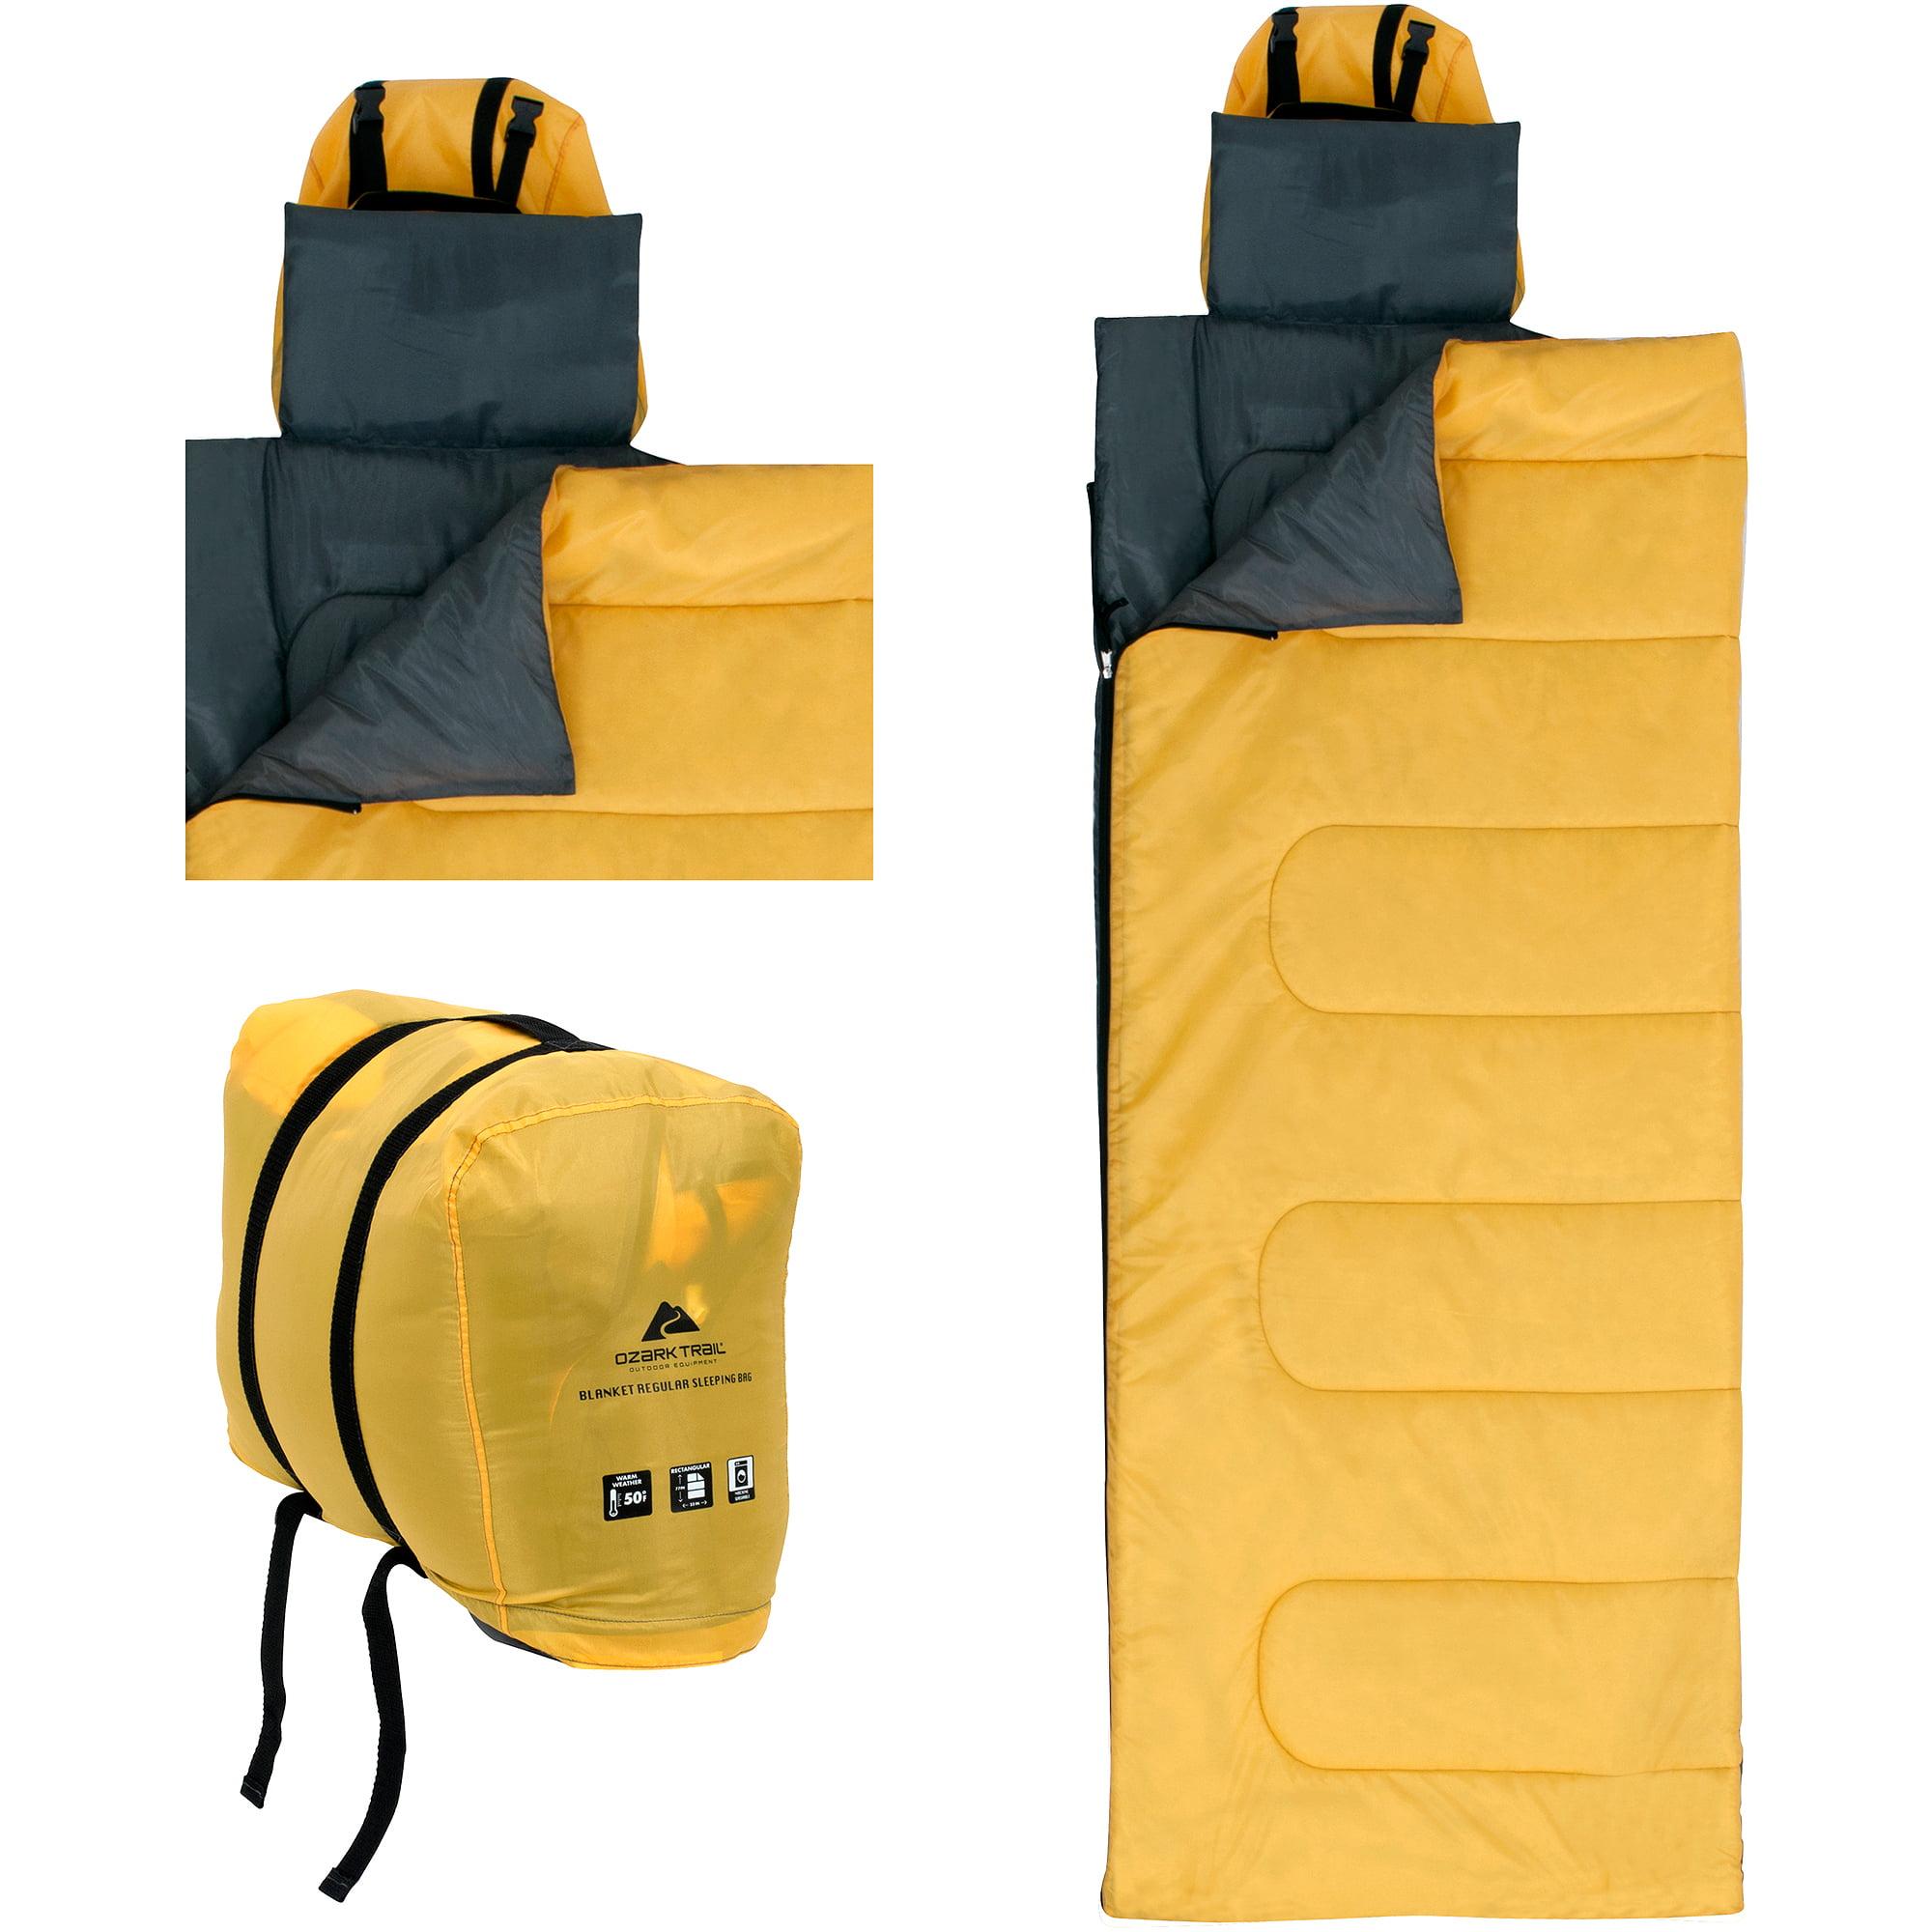 Cheap Ozark Trail 50F OPP Blanket Regular Sleeping Bag, Yellow/Gray Review